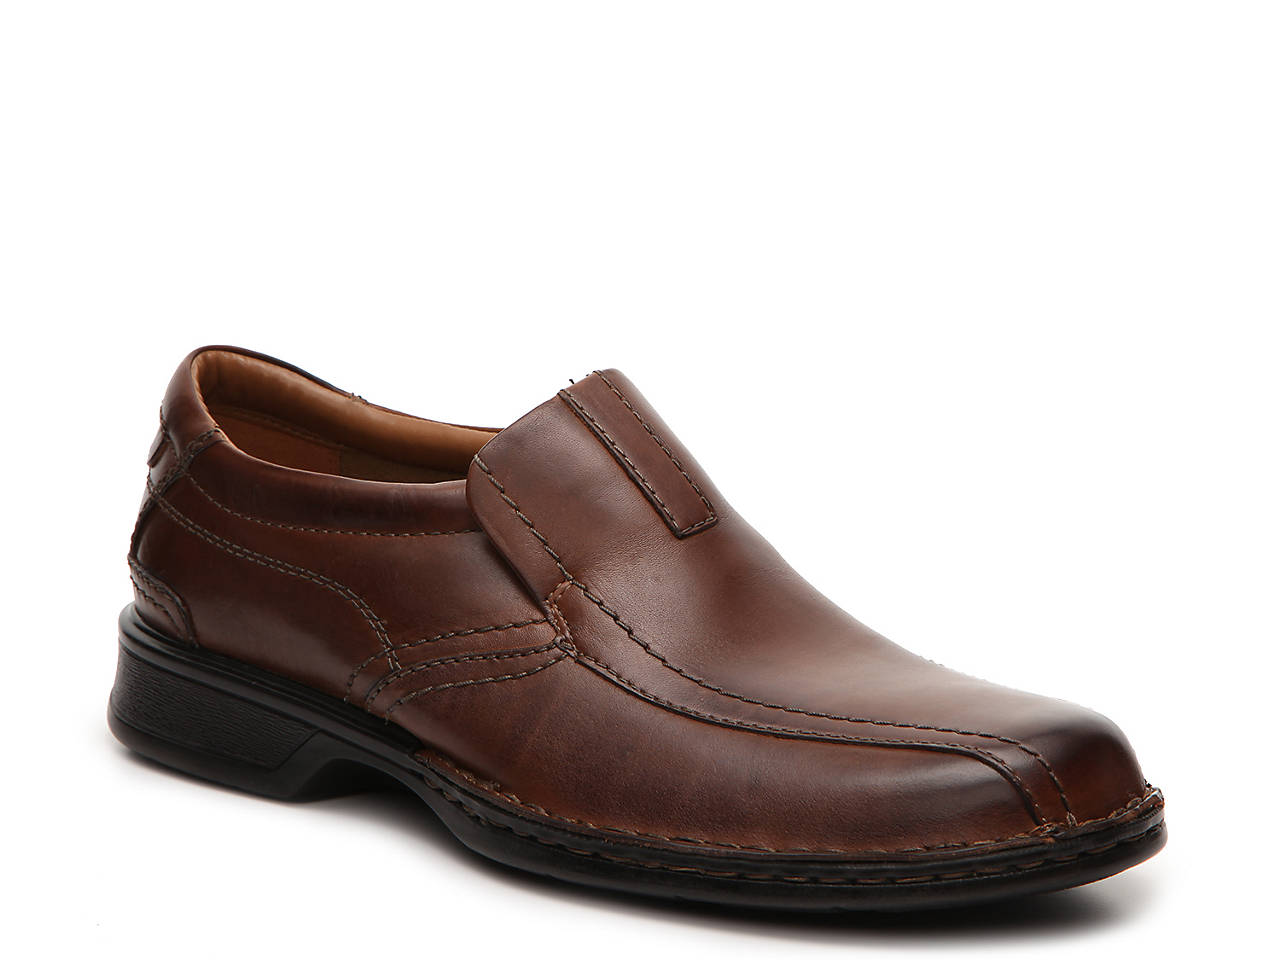 Clarks Escalade Step Slip-On Shoe